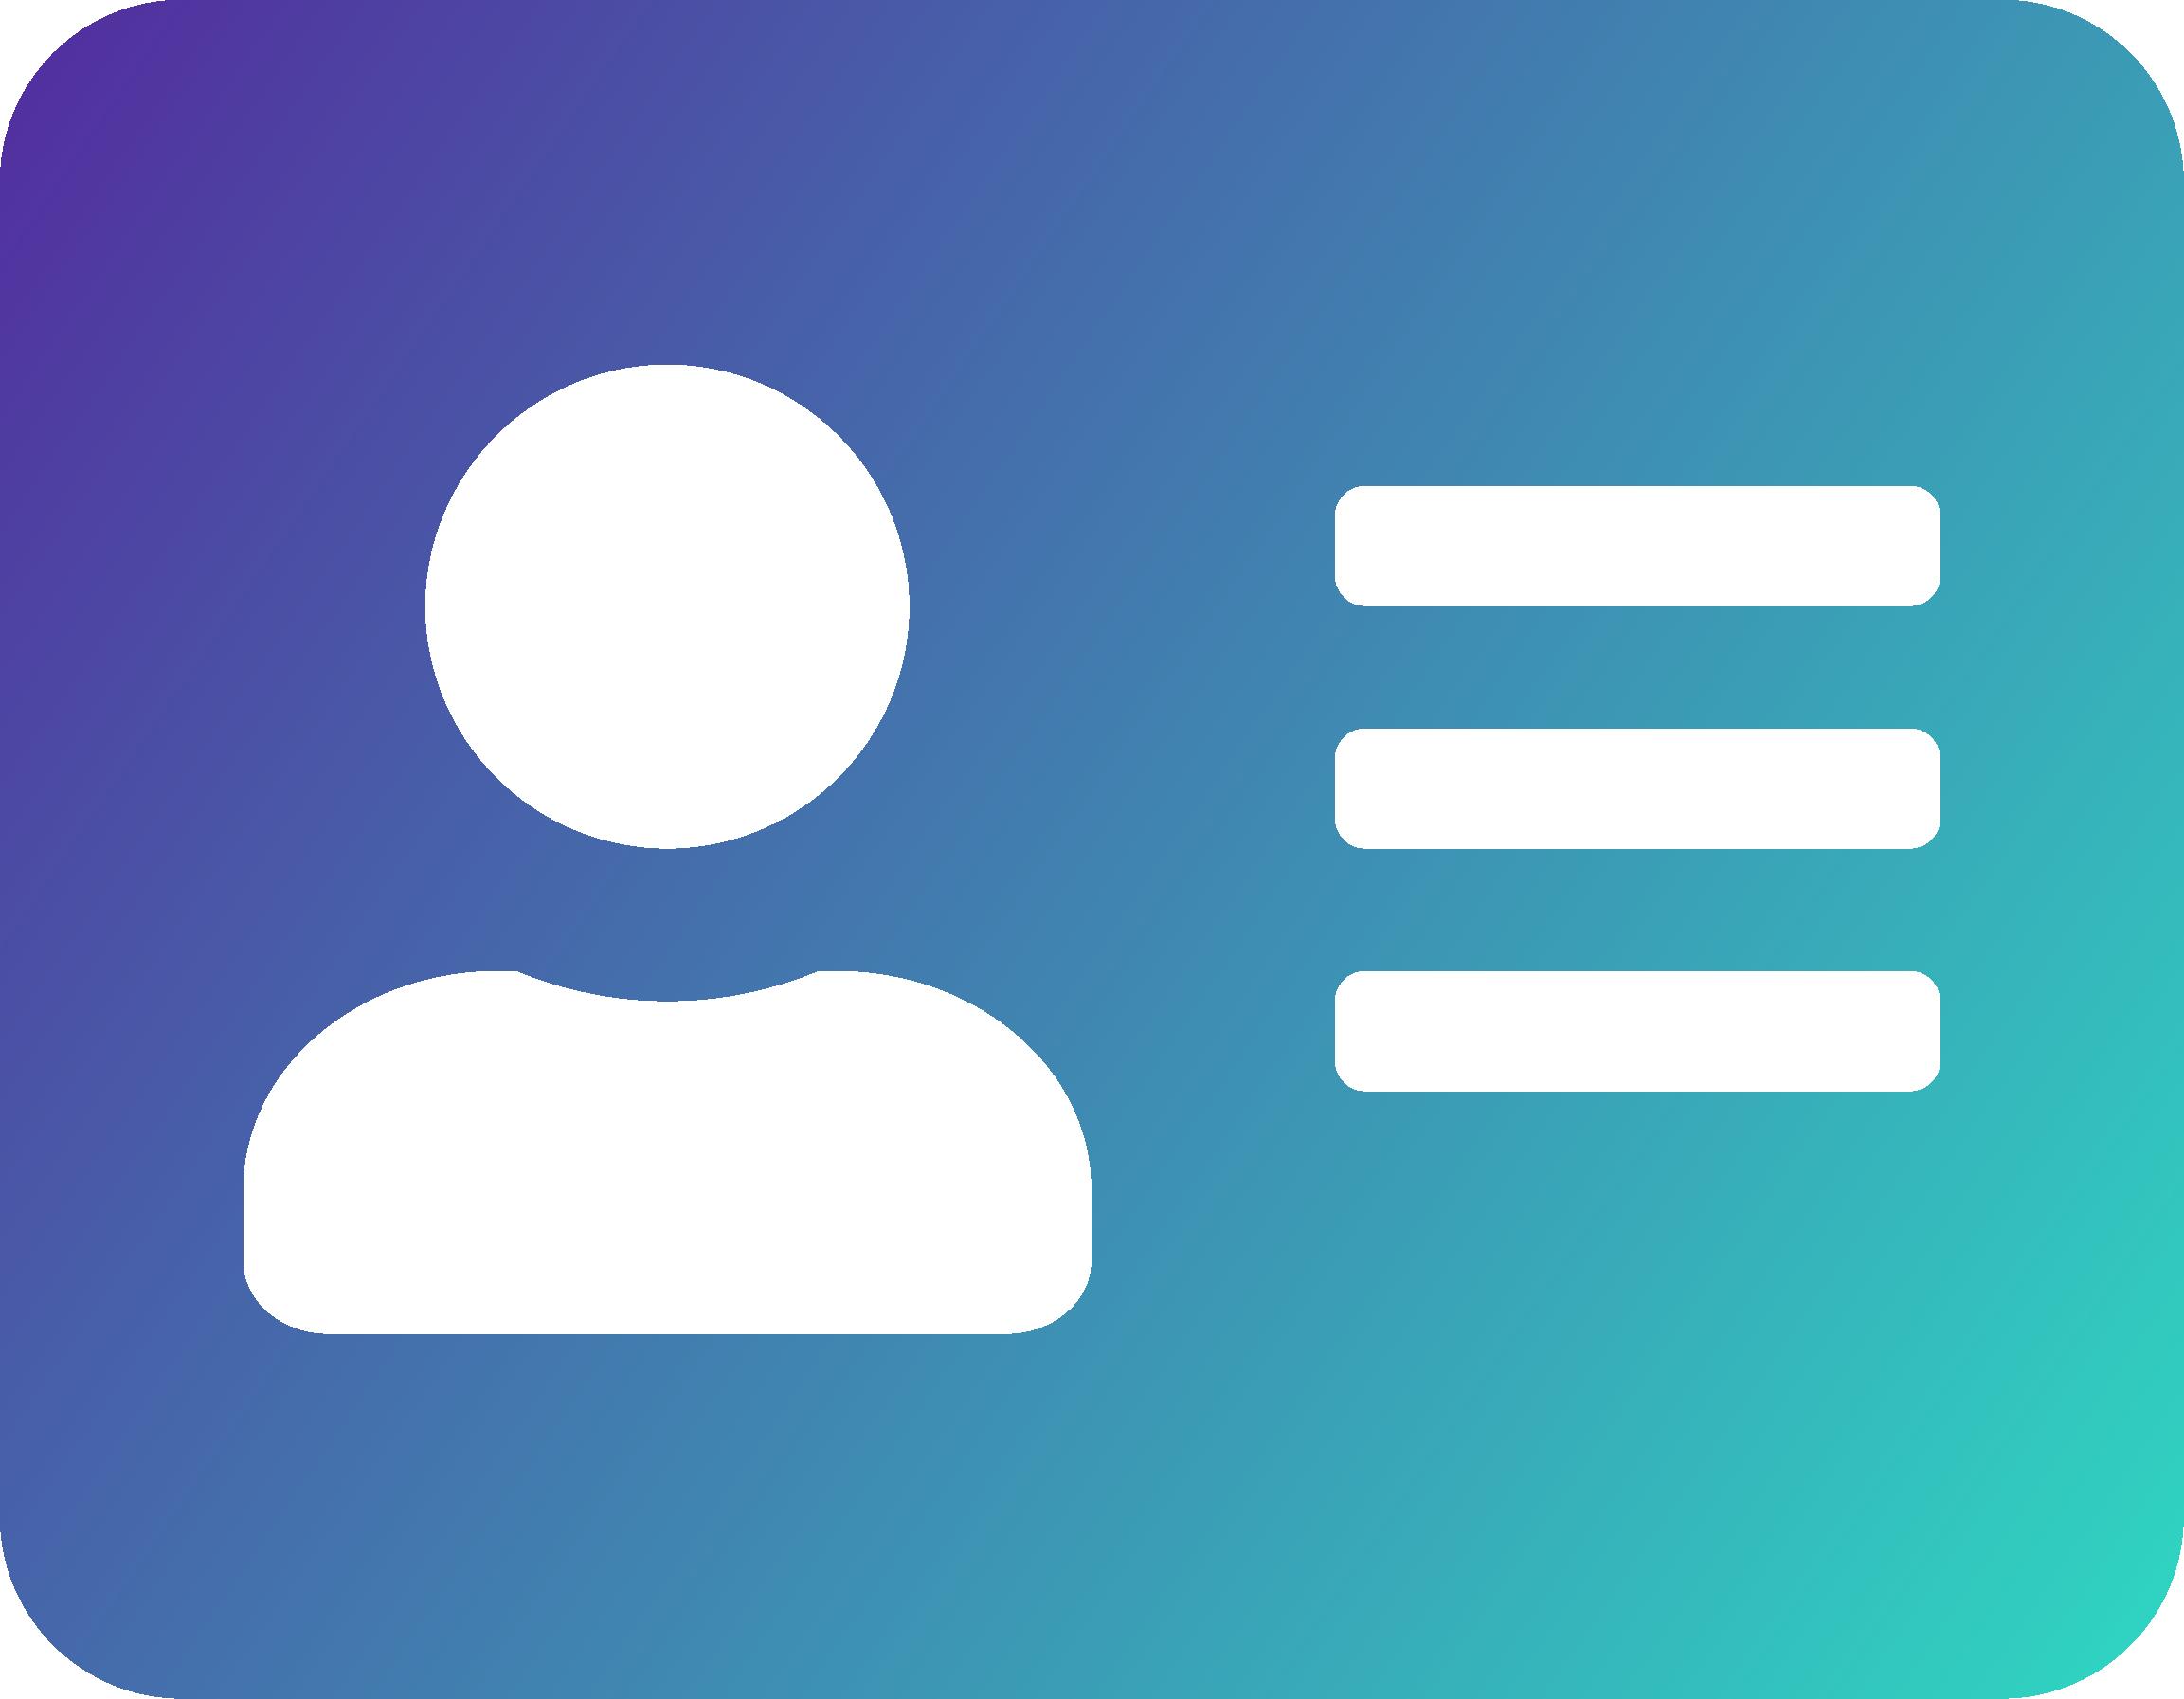 On demand icon